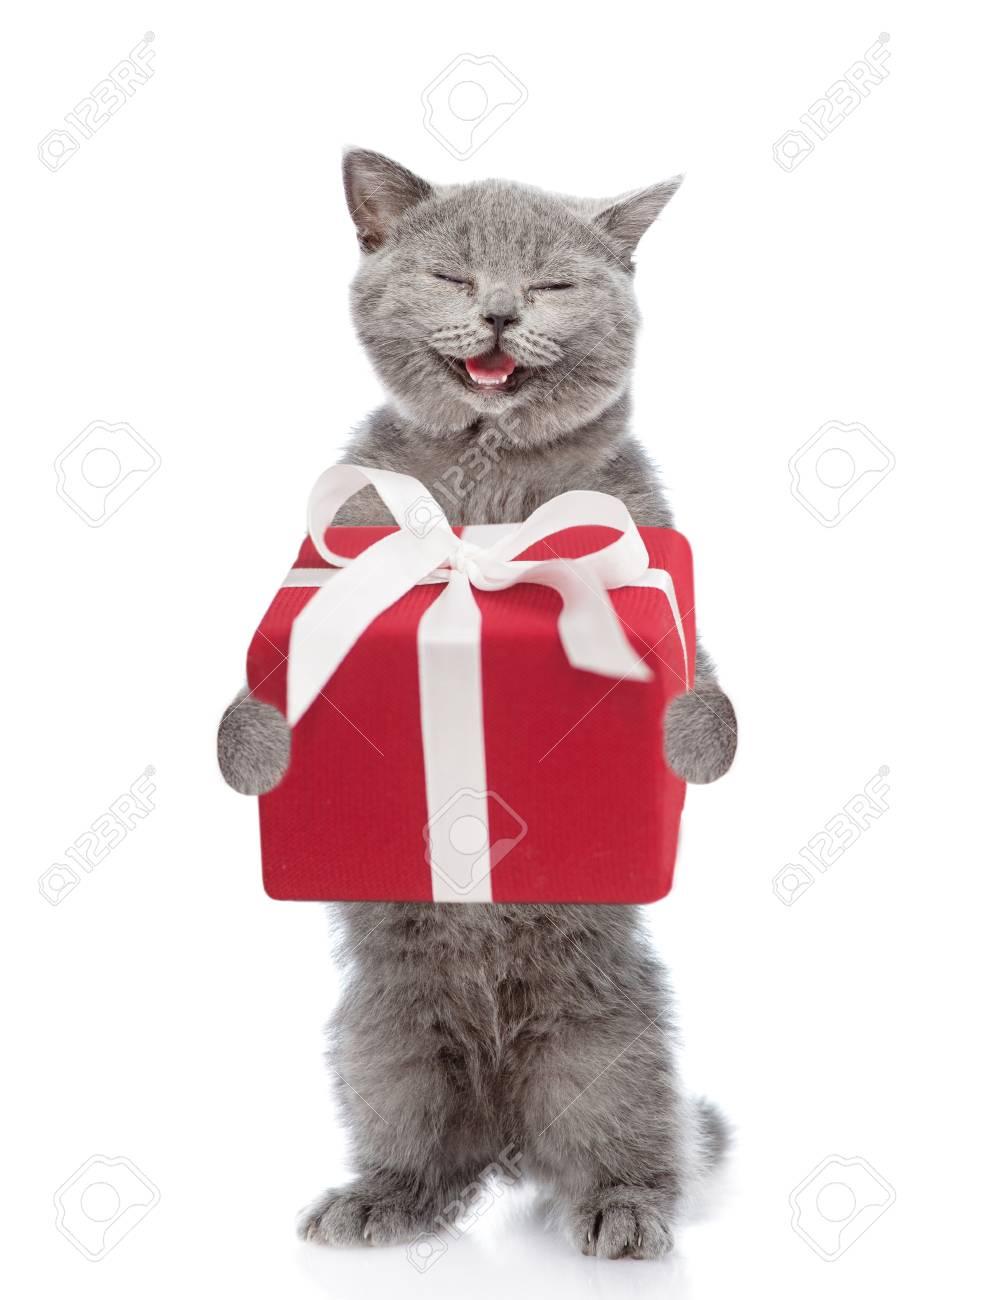 Happy Scottish kitten with gift box. isolated on white background. - 89135883